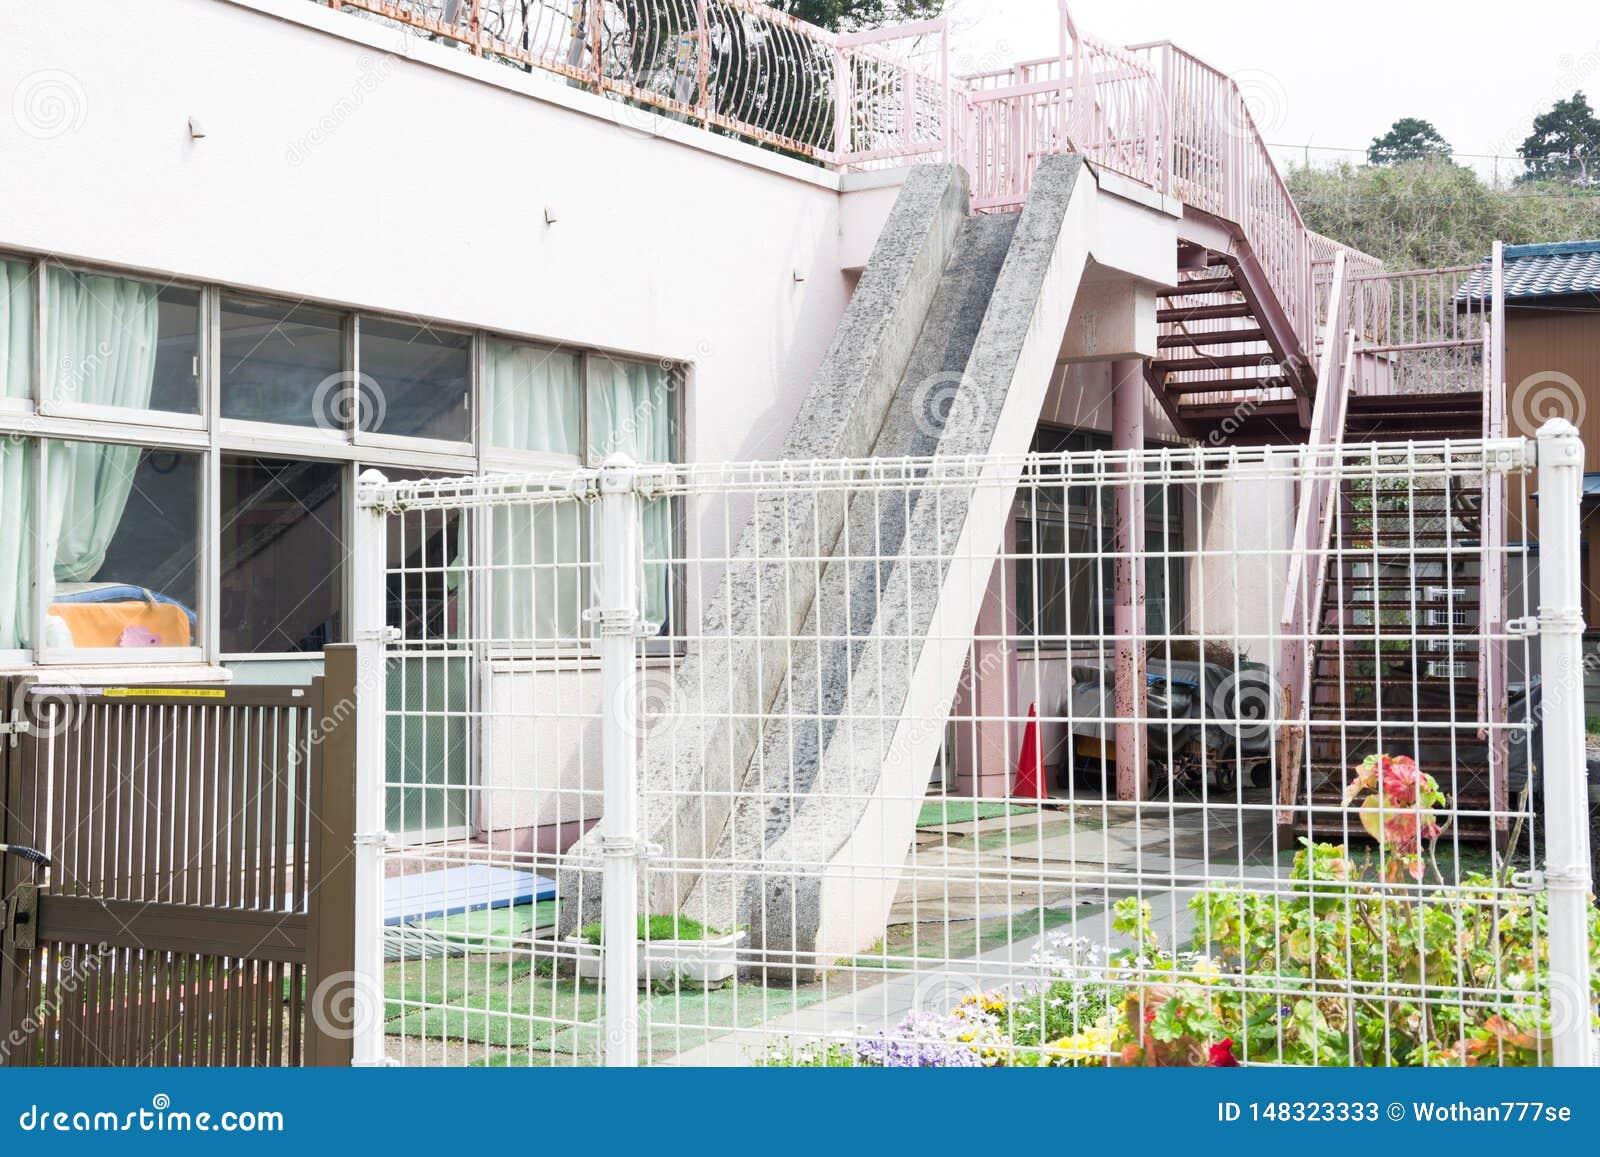 Cement slide